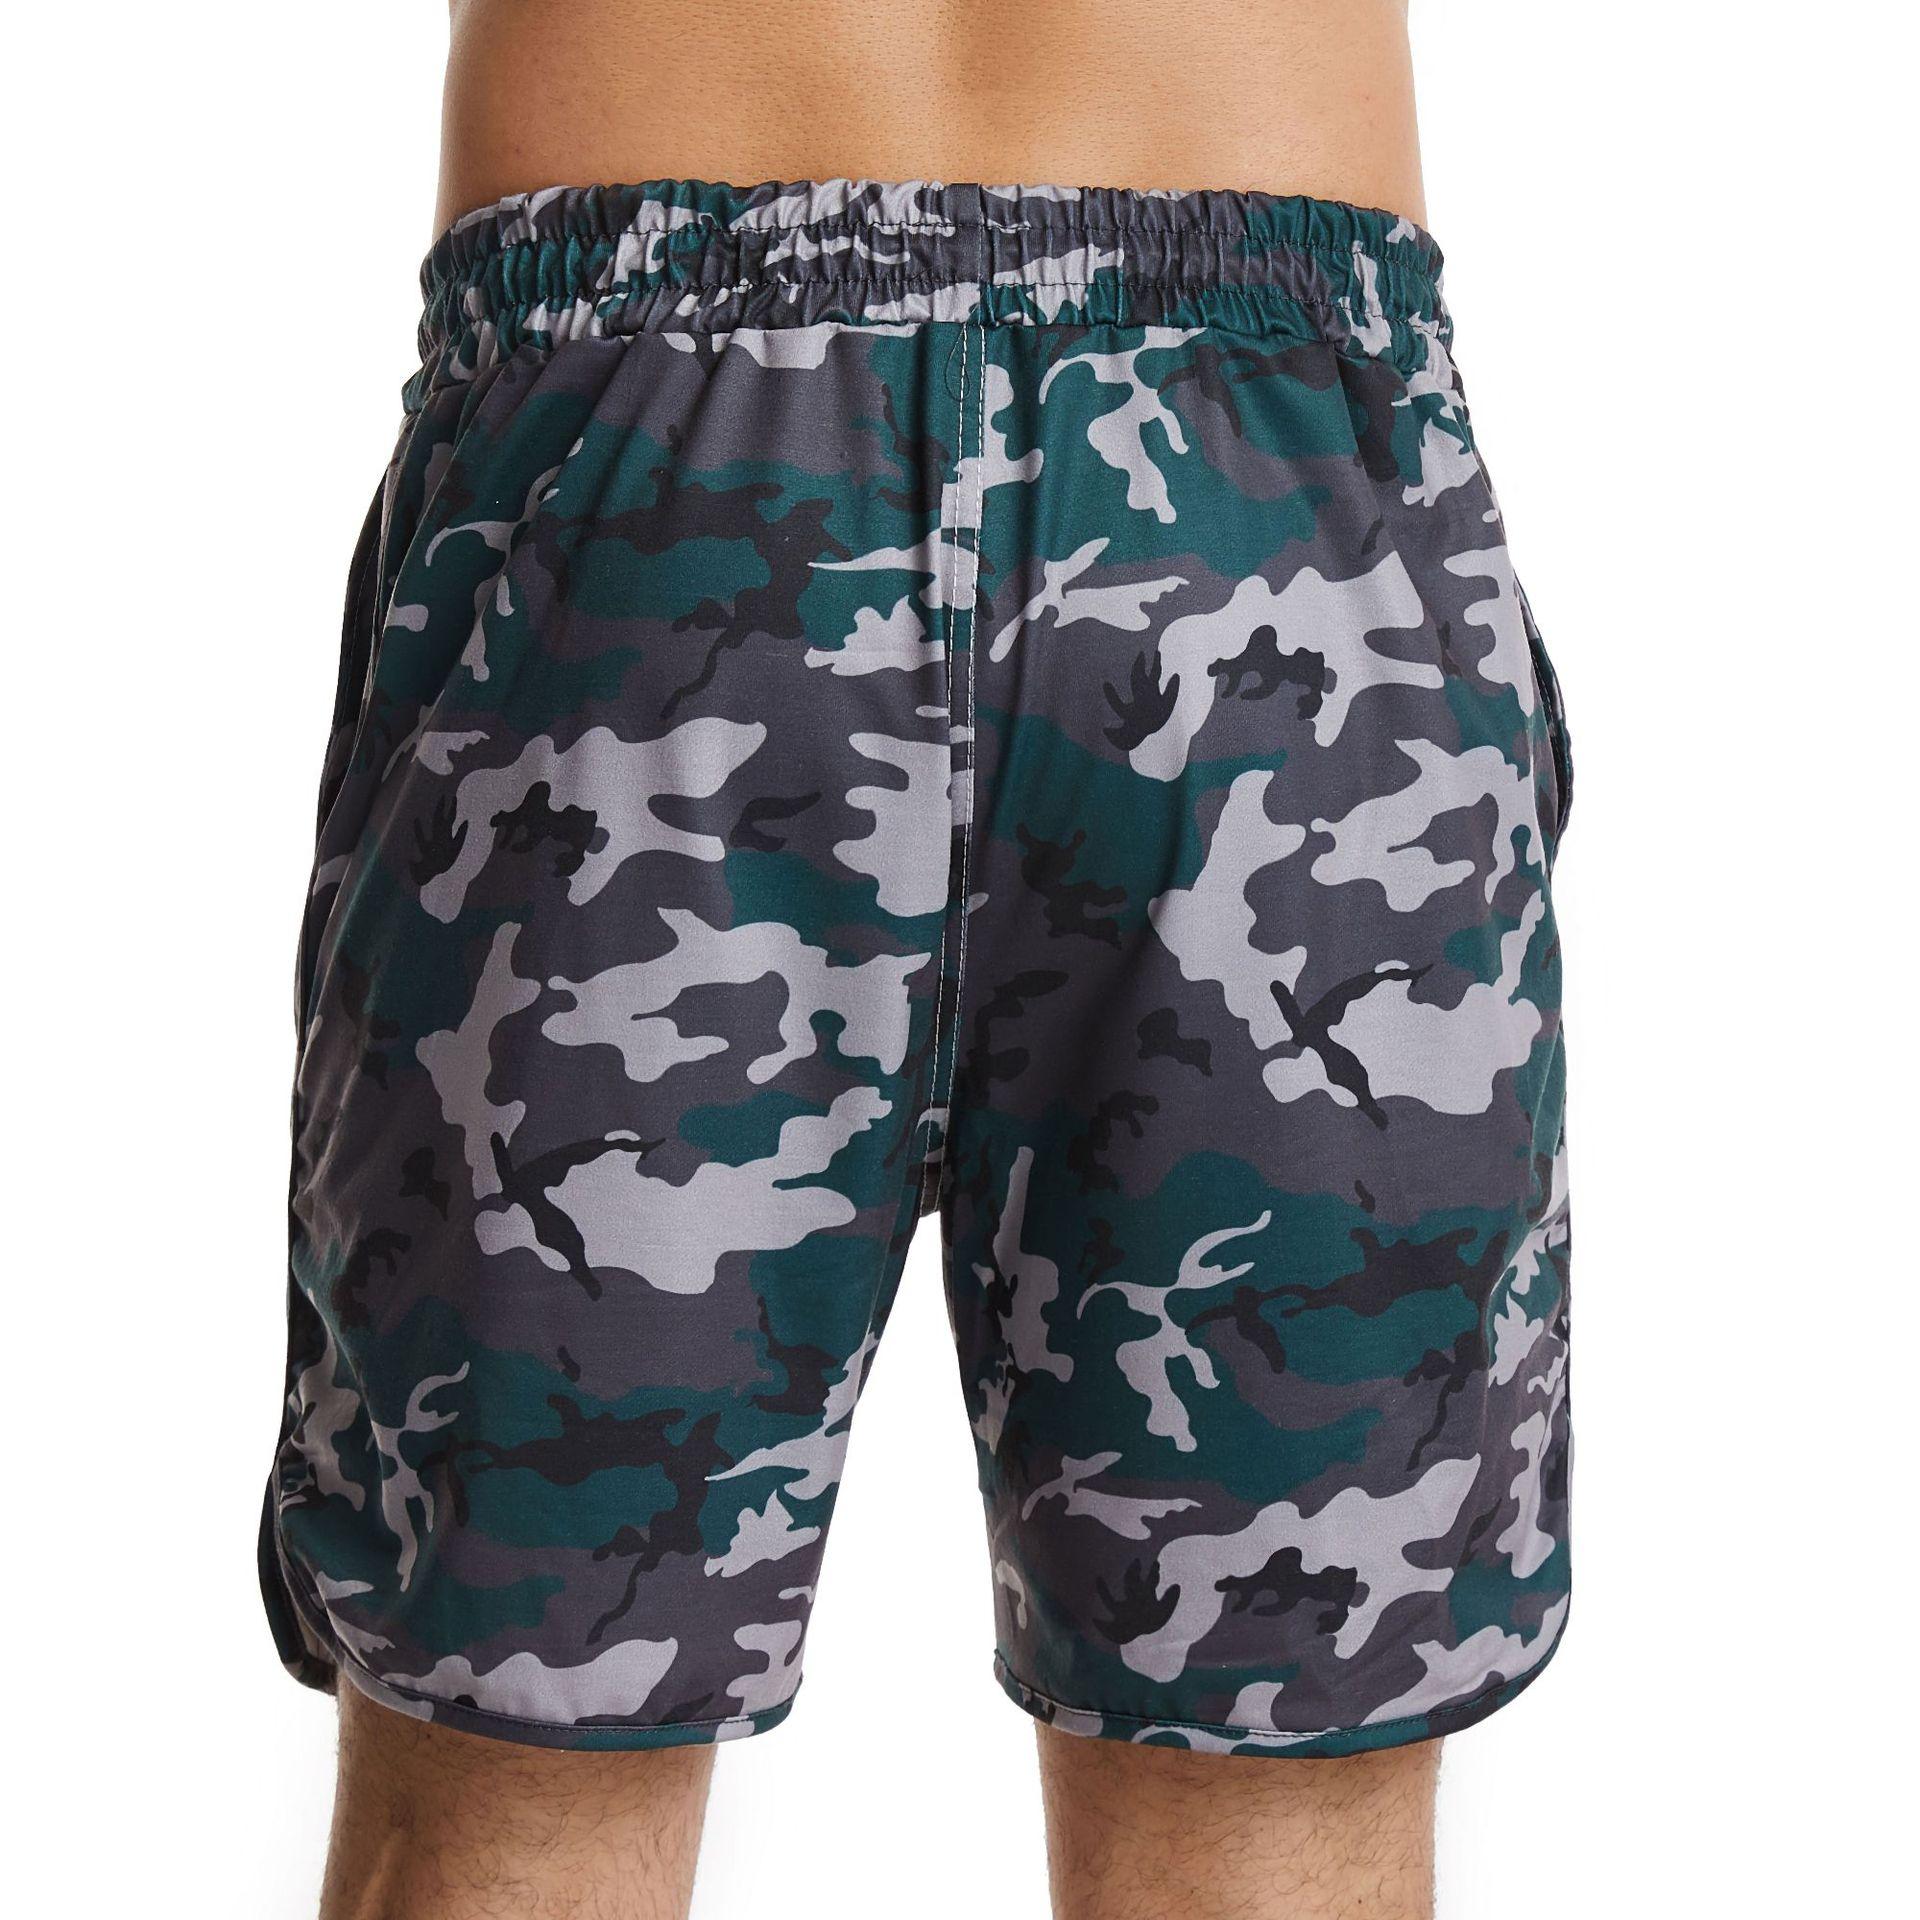 product-Ruiteng-Customized Camouflage Sublimation Drawstring Sports Short for Men Beach Short-img